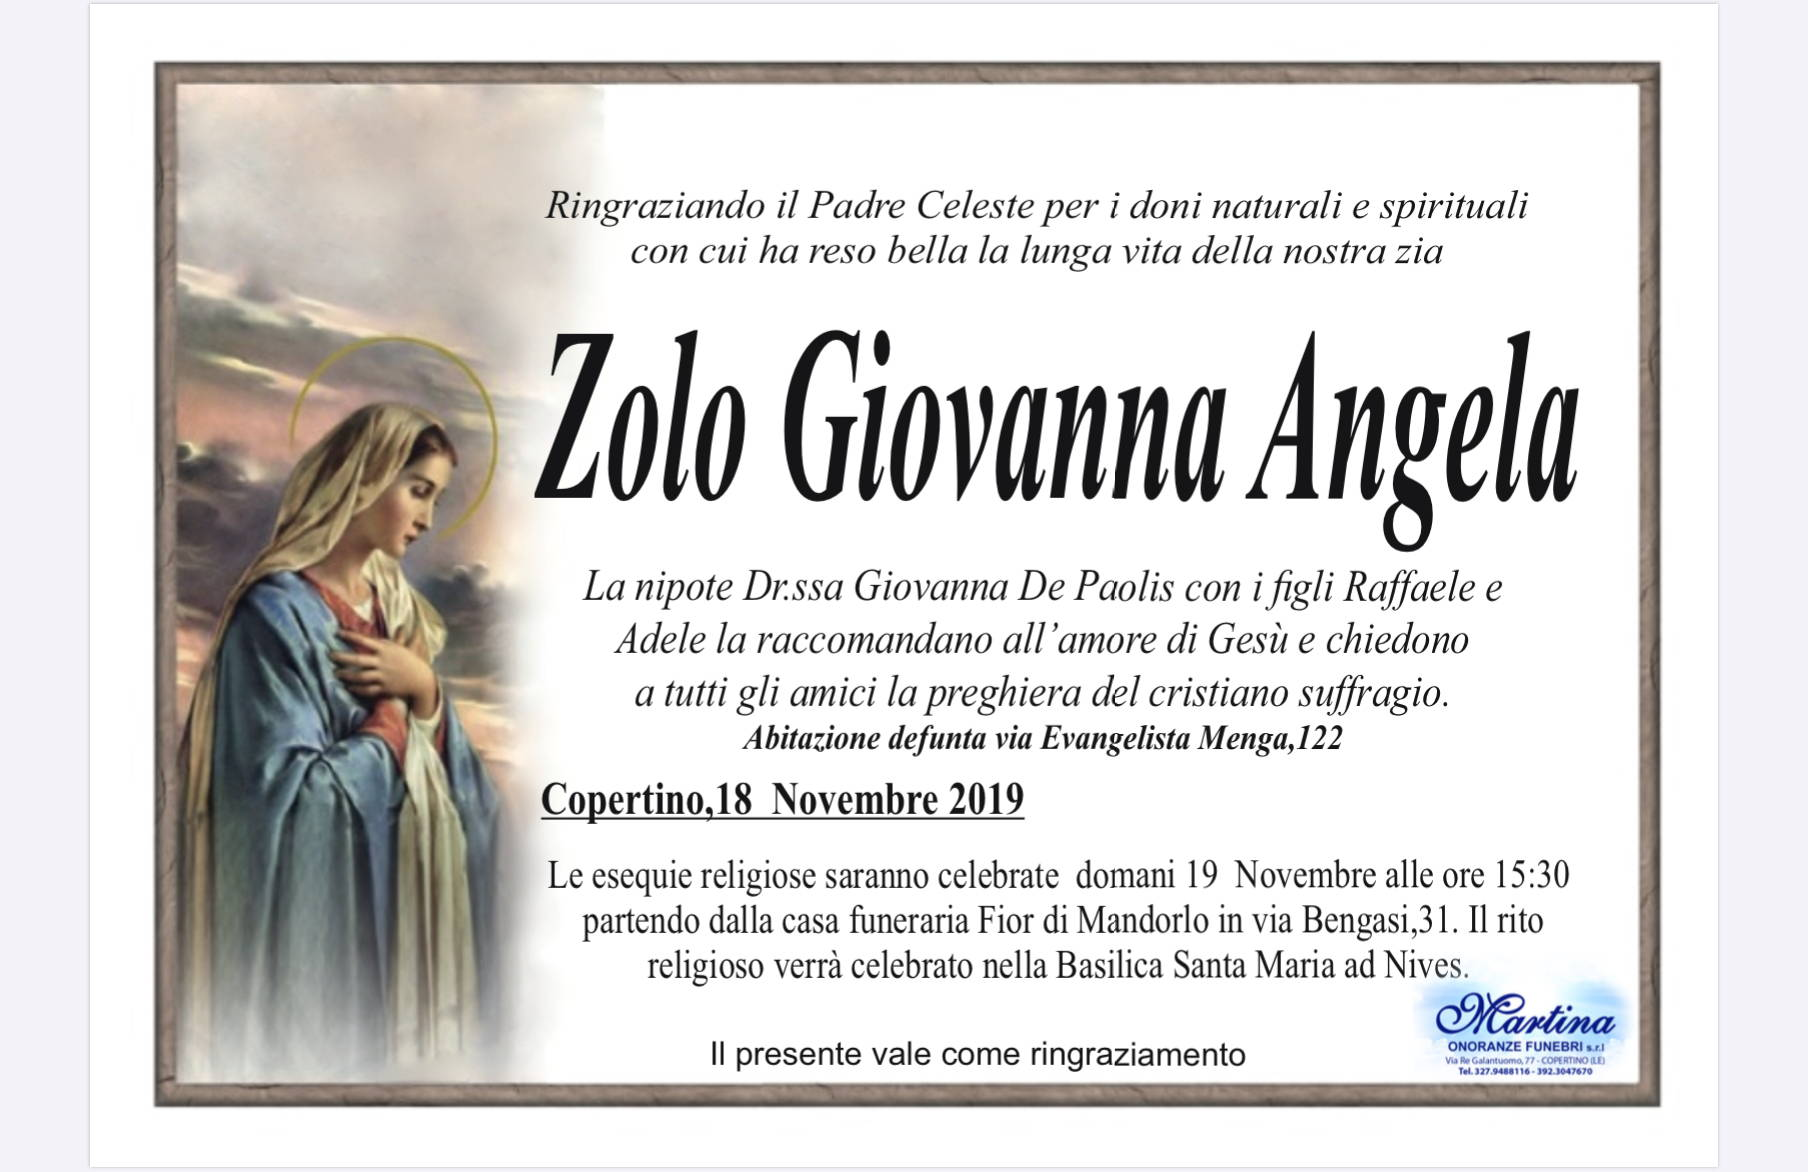 Giovanna Angela Zolo